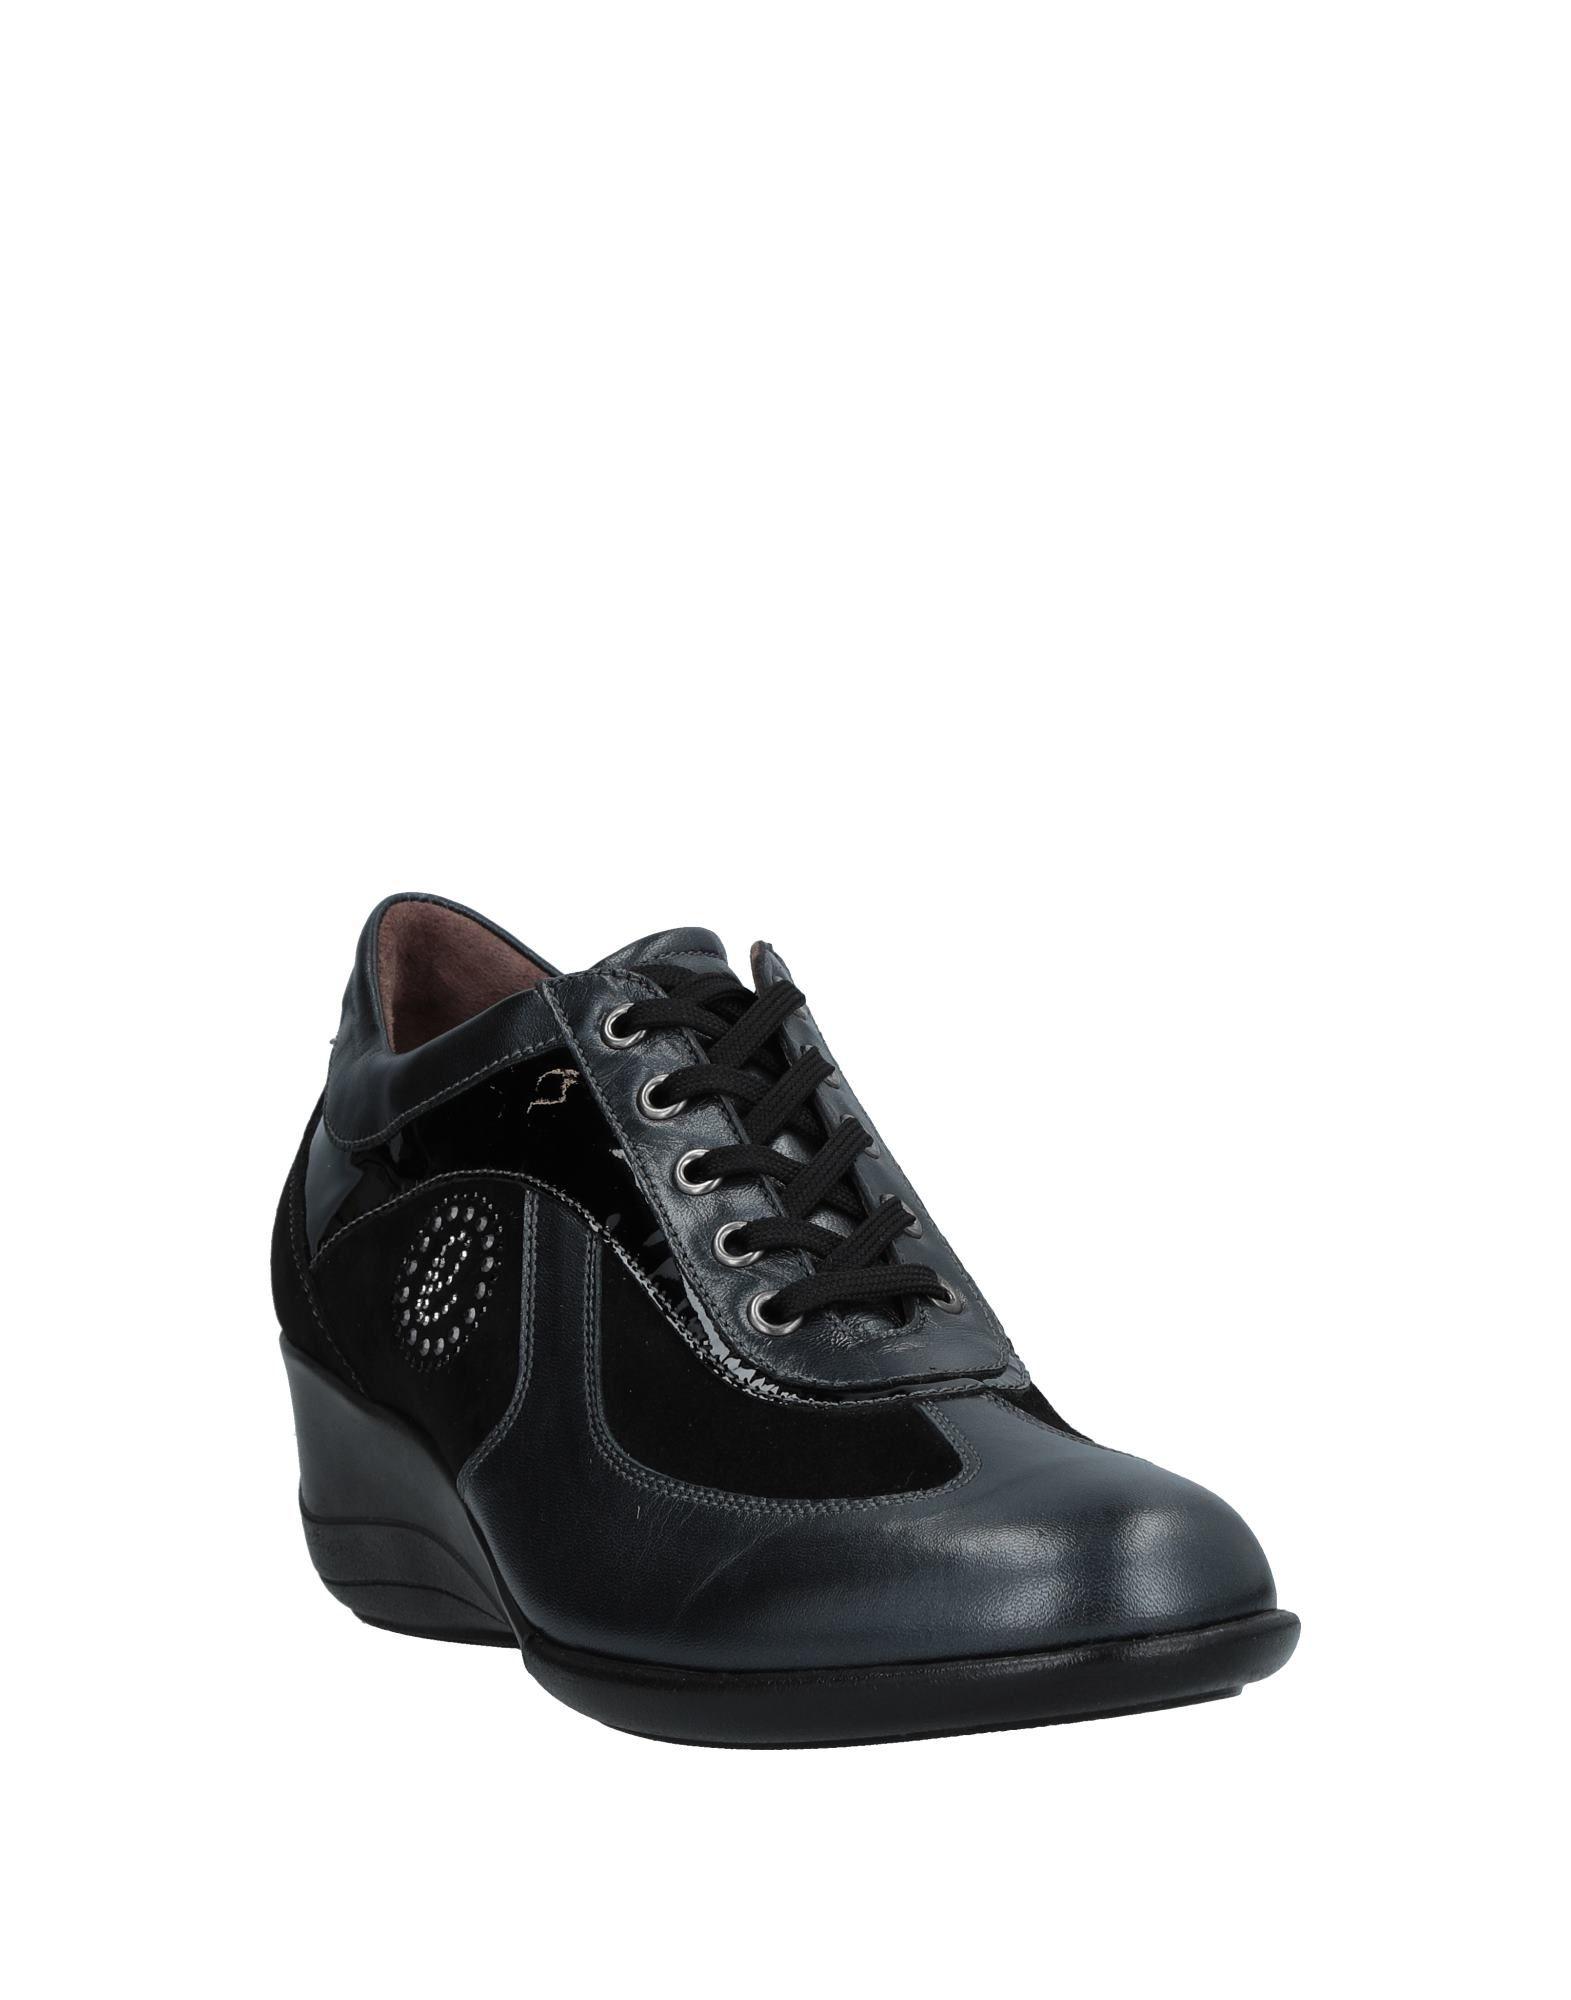 Lionelle Sneakers Qualität Damen  11529432HD Gute Qualität Sneakers beliebte Schuhe df4a13